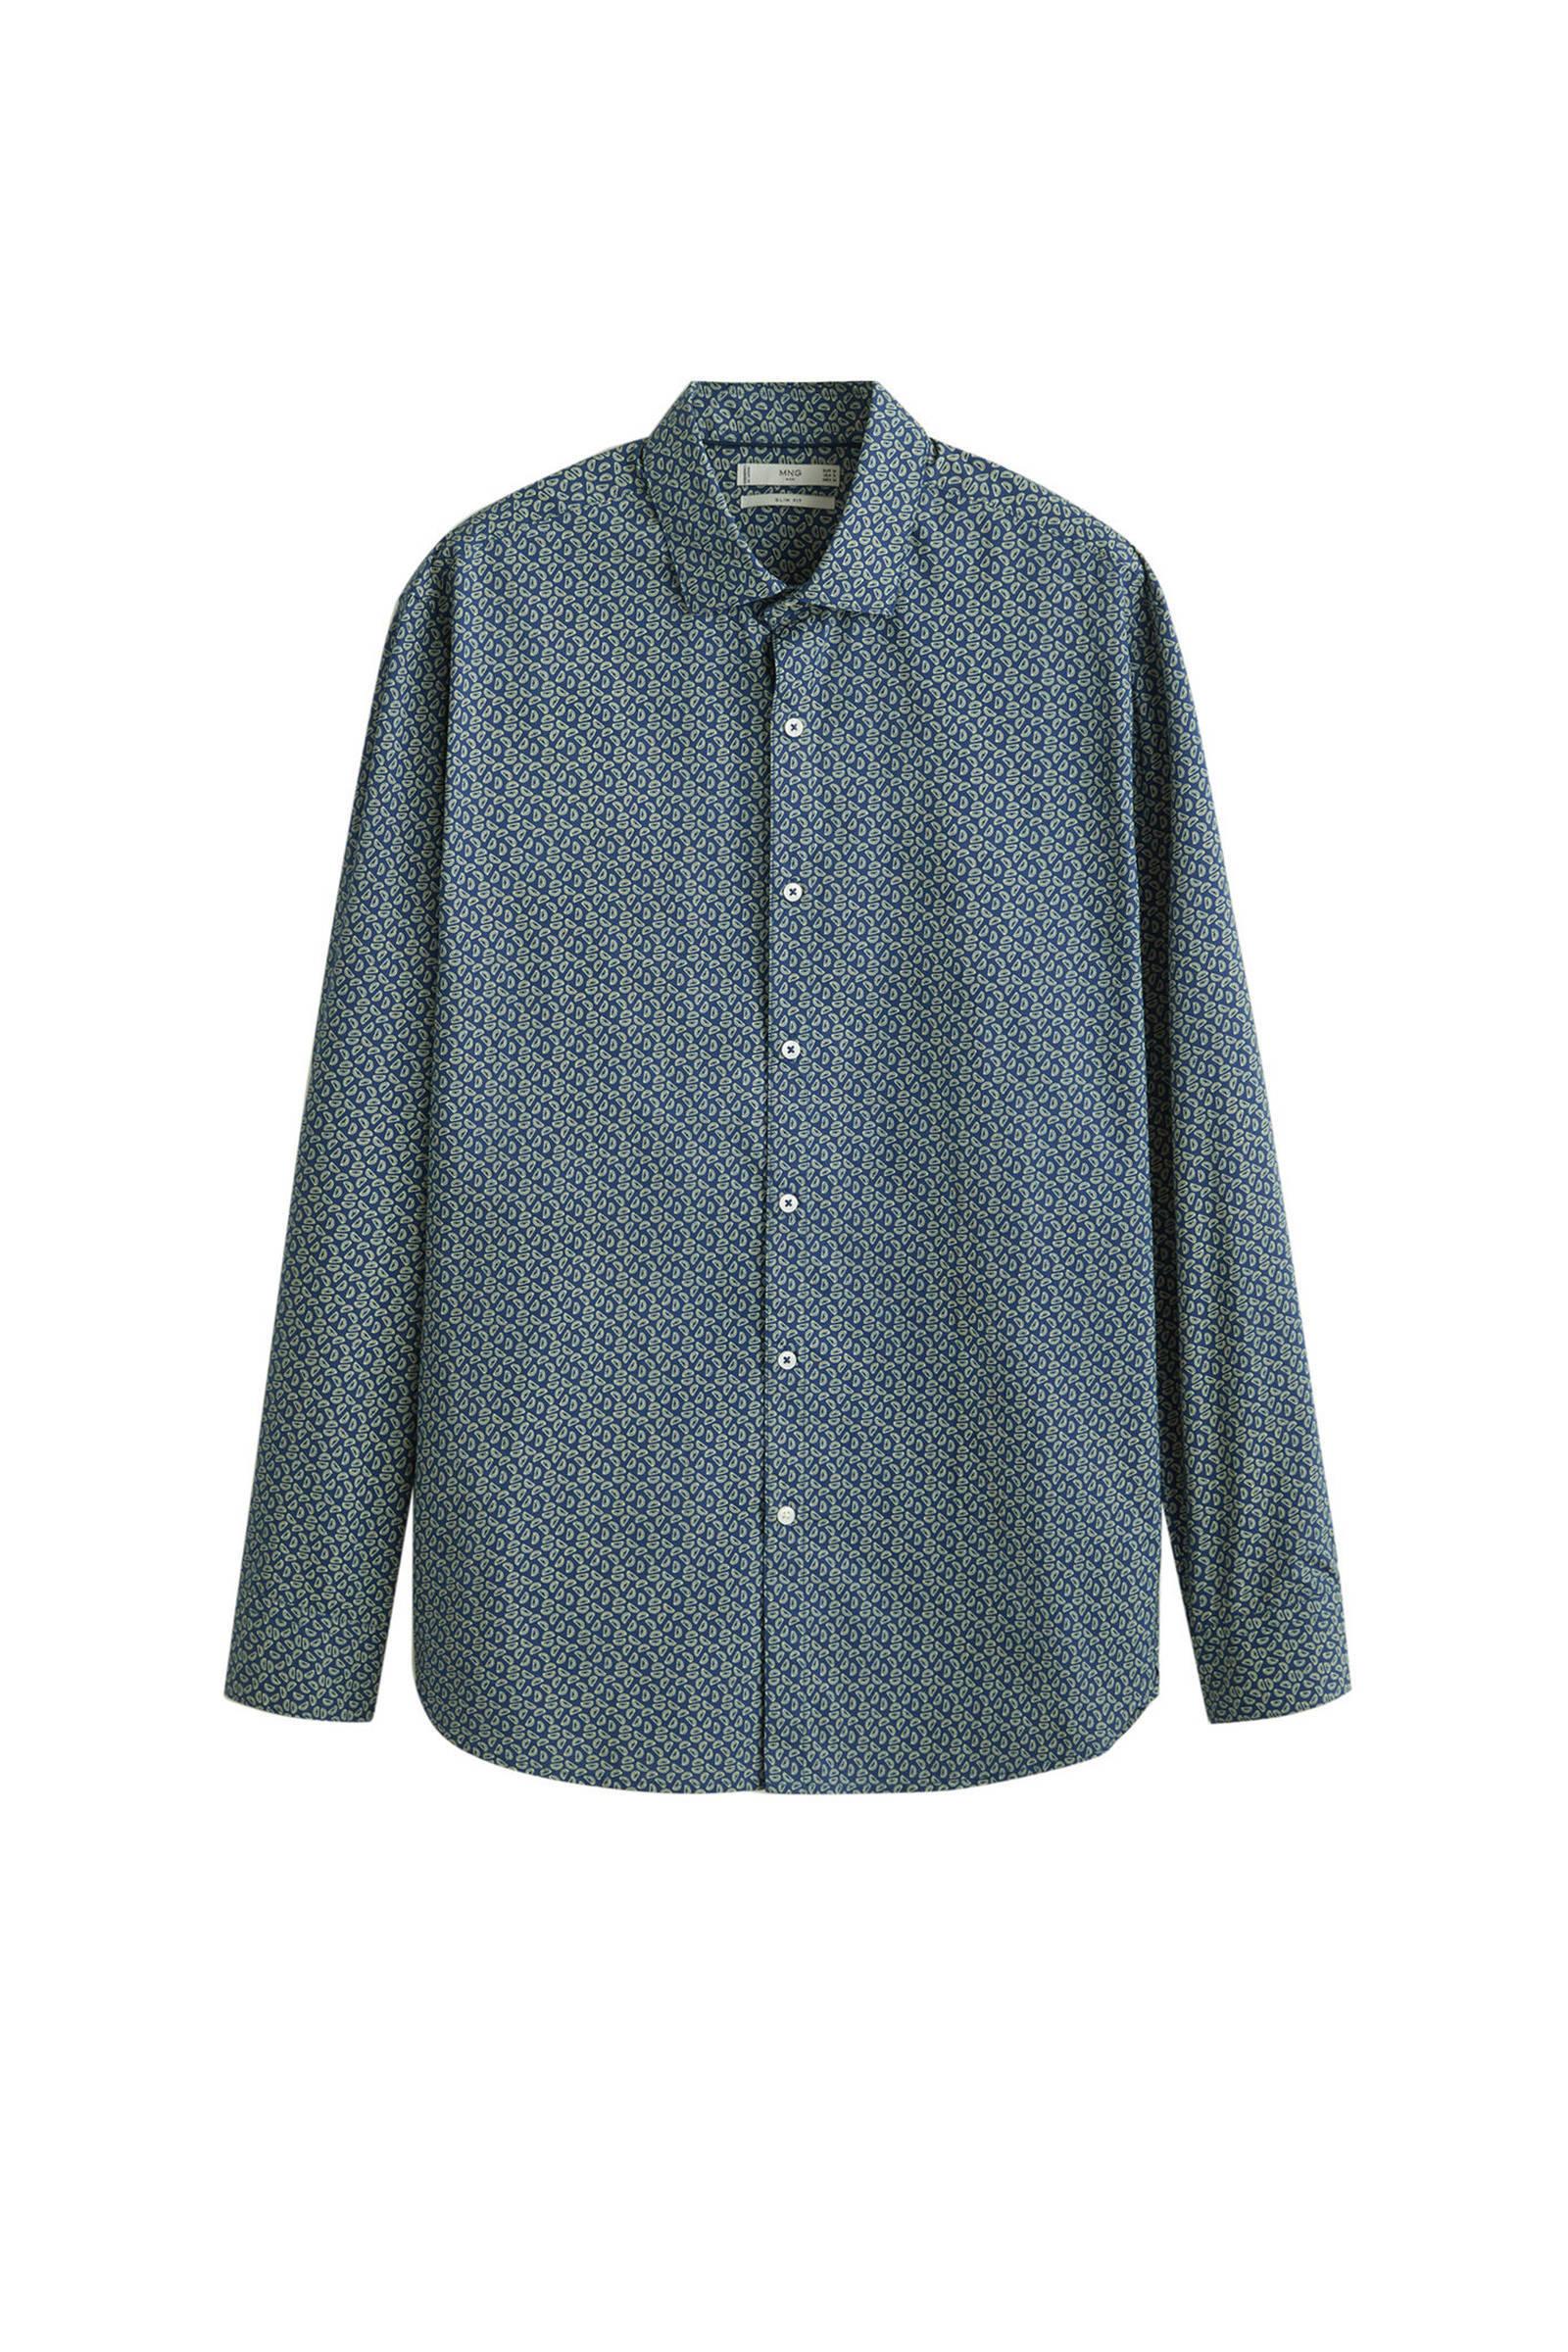 Mango Man slim fit overhemd donkerblauw   wehkamp